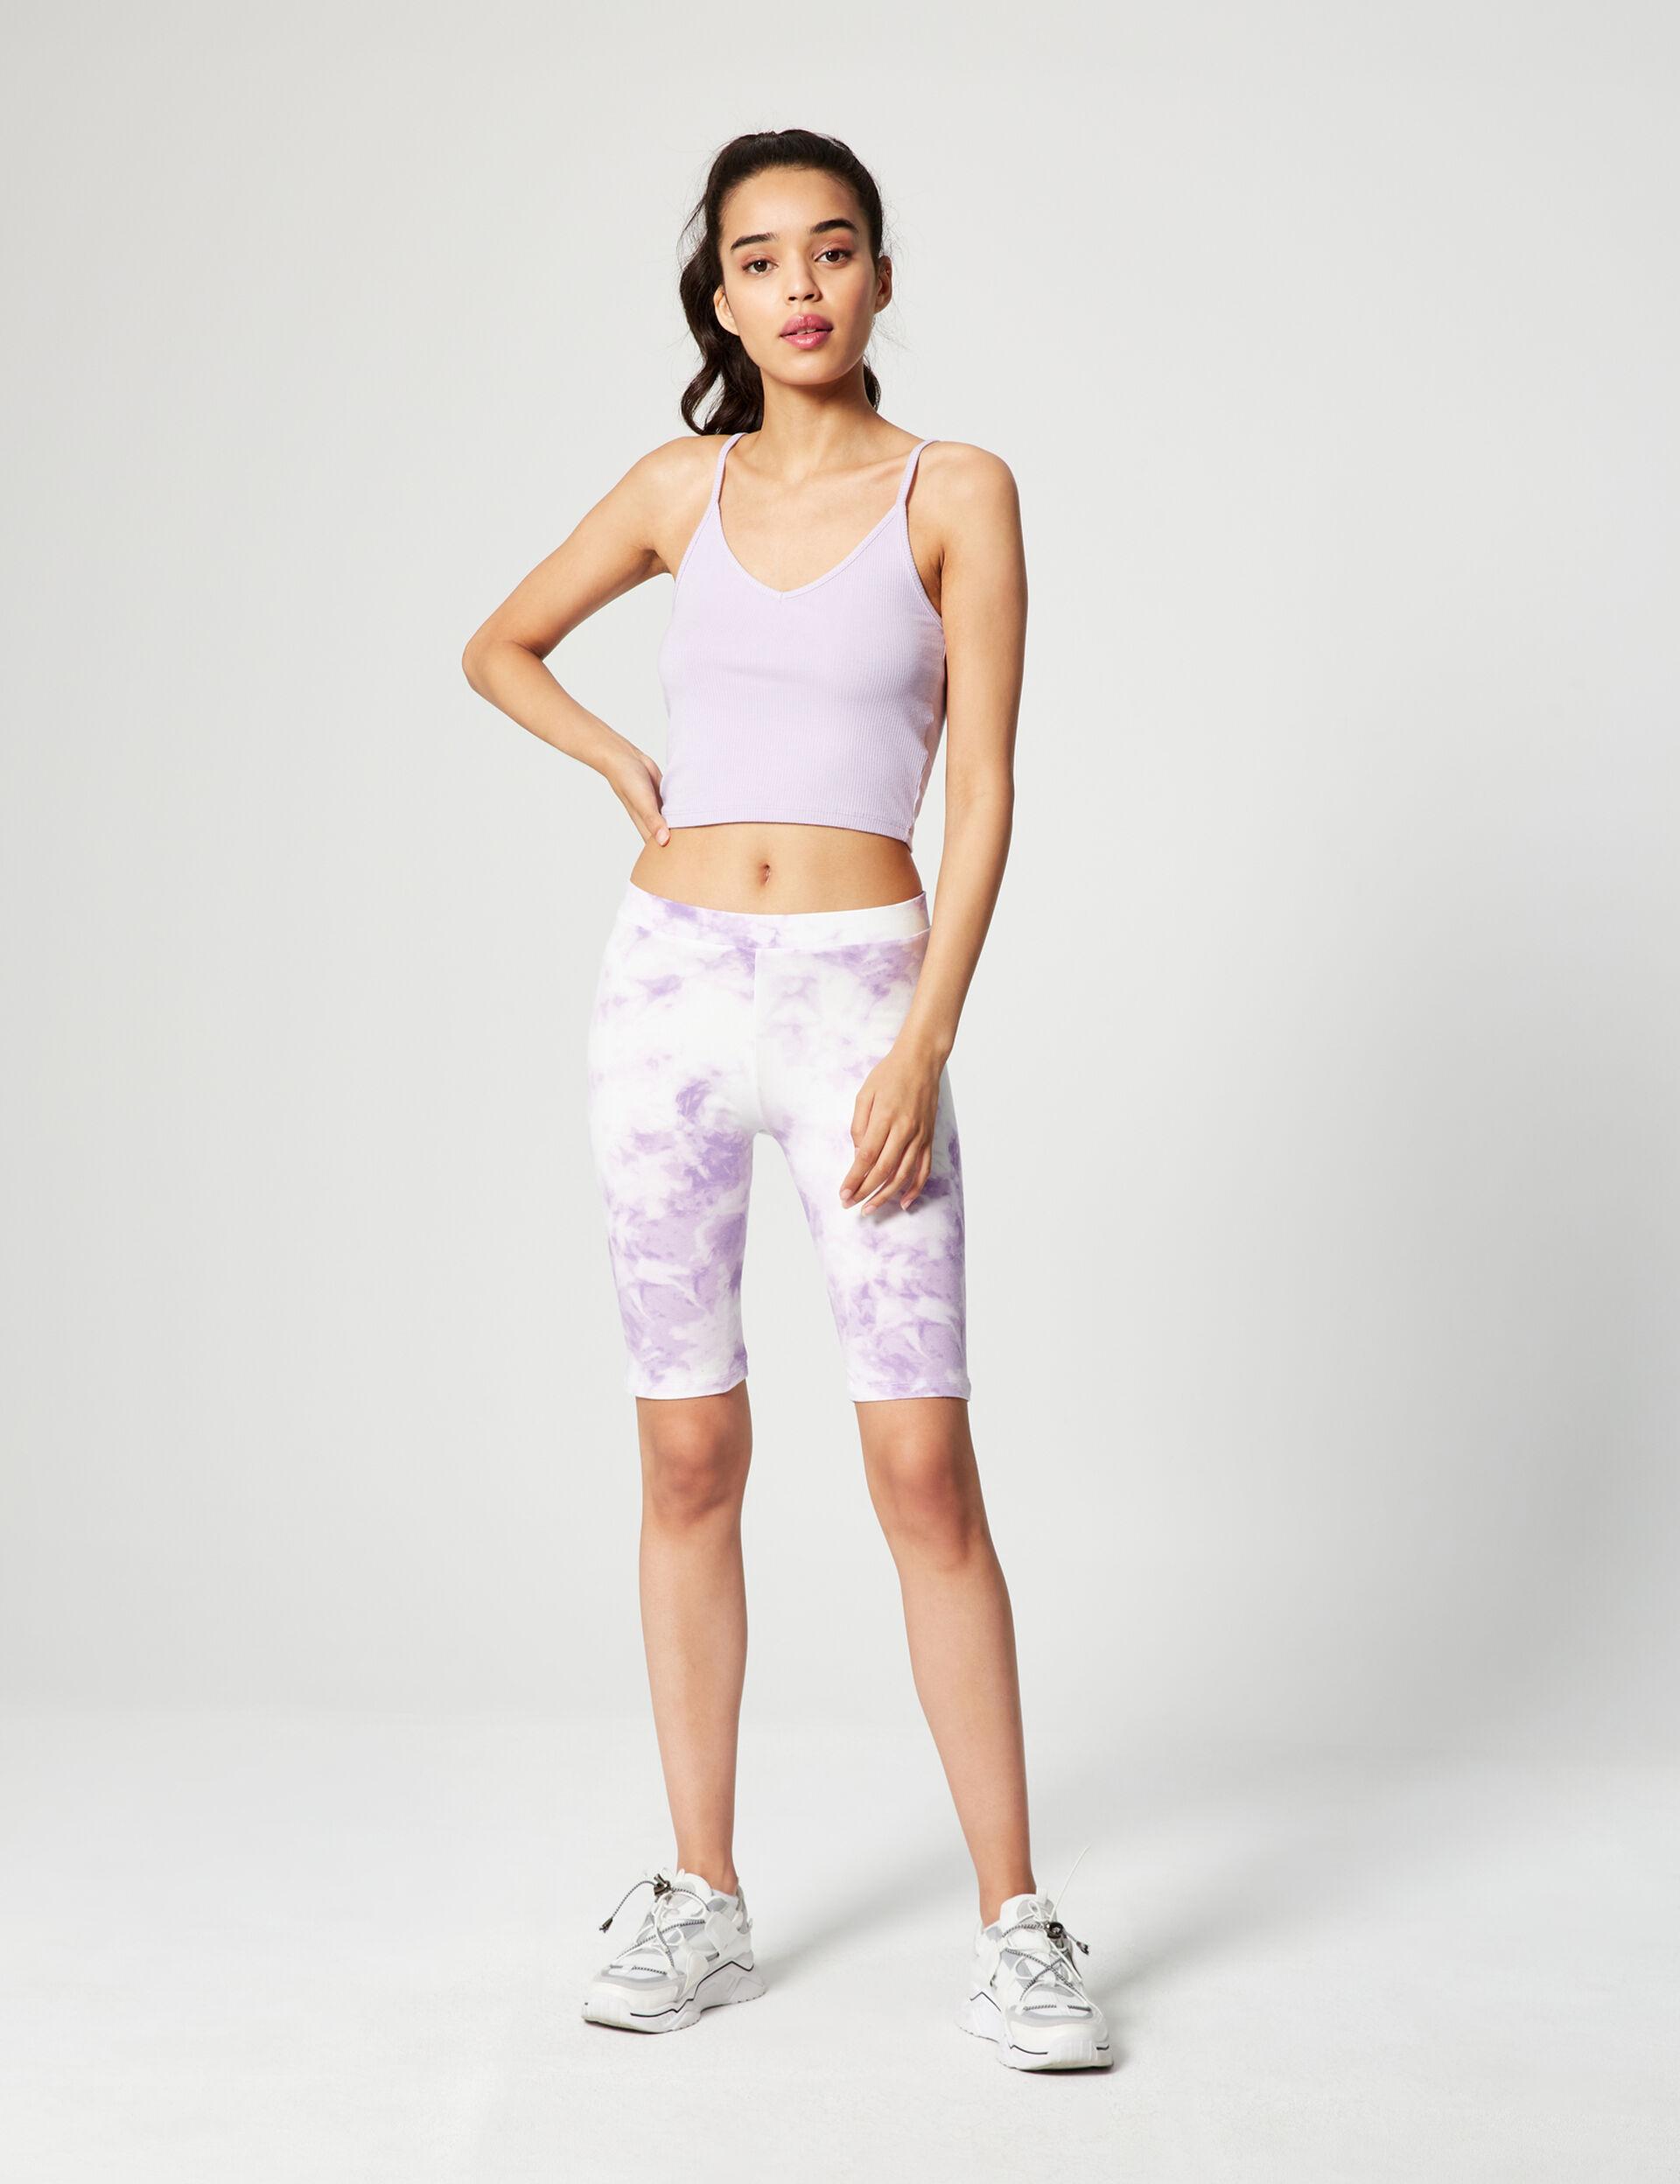 Tie-dye cycling shorts